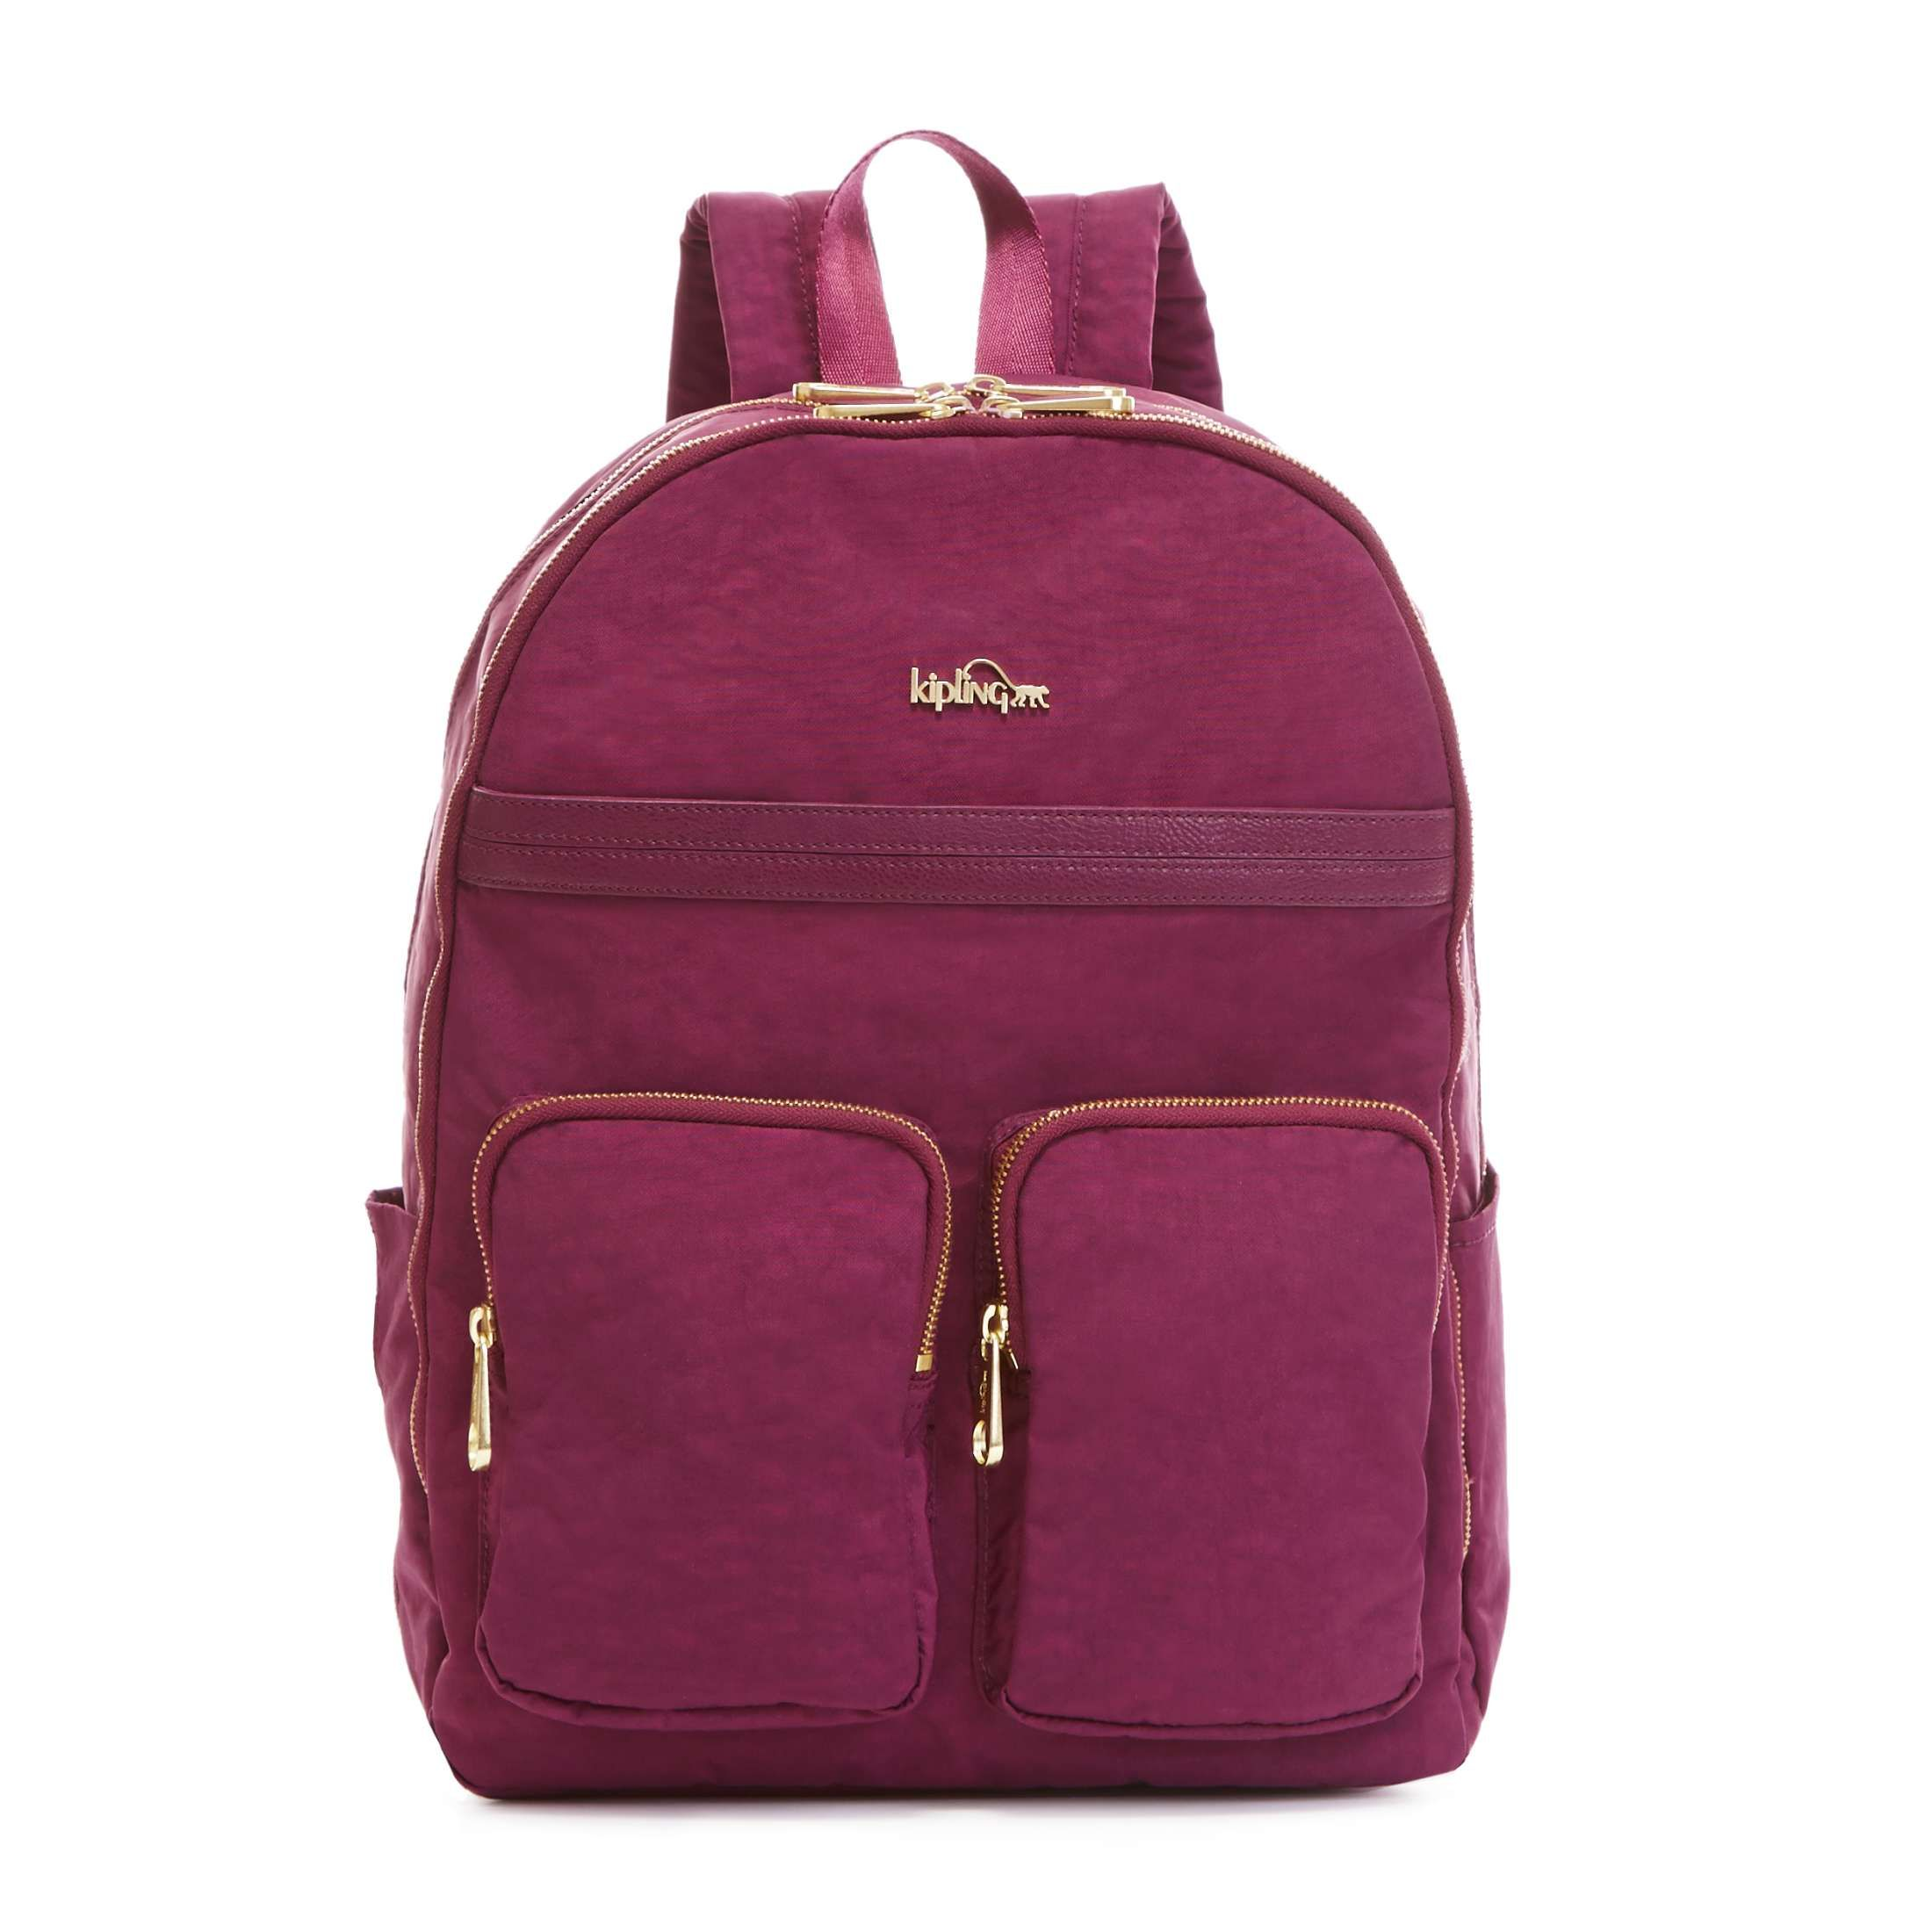 25 best ideas about kipling backpack on pinterest school handbags - Bag